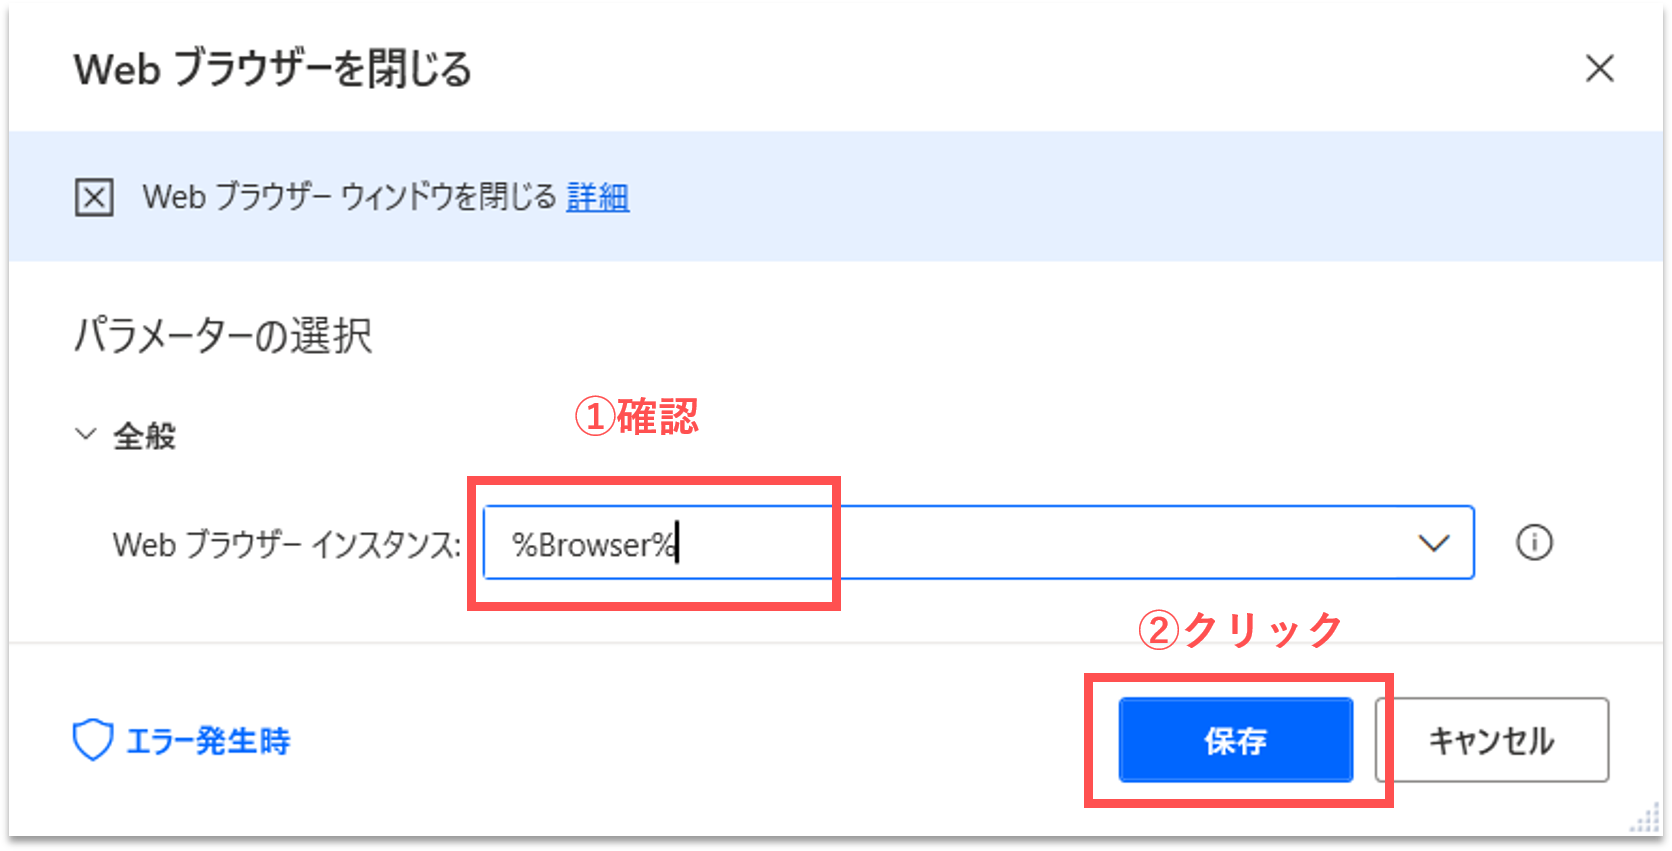 set close browser